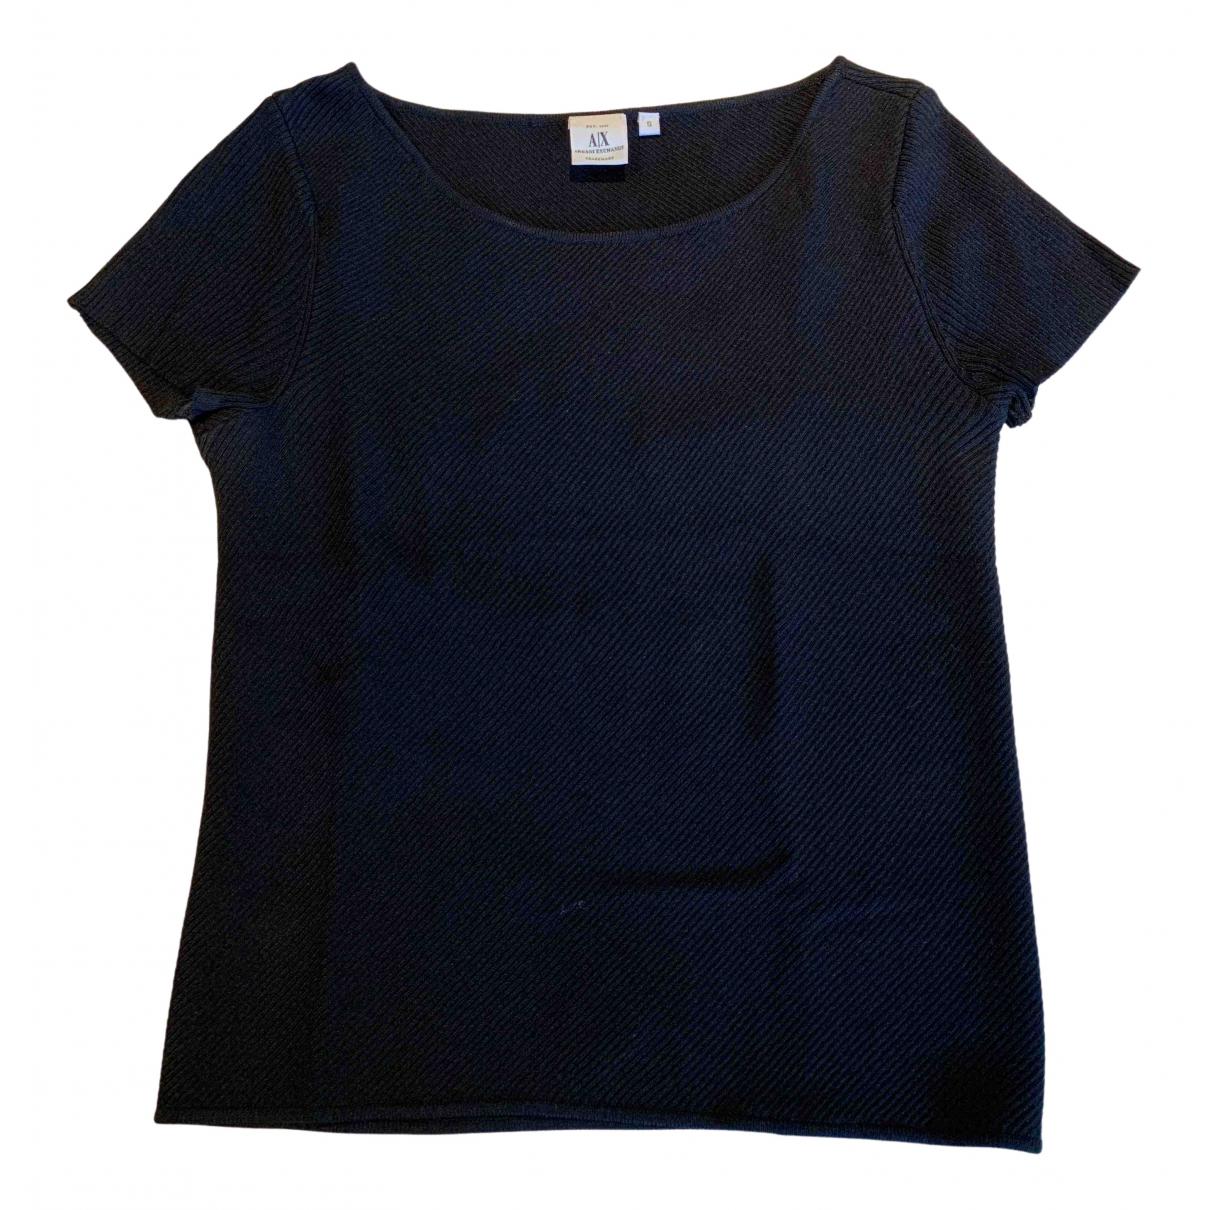 Emporio Armani \N Black  top for Women S International